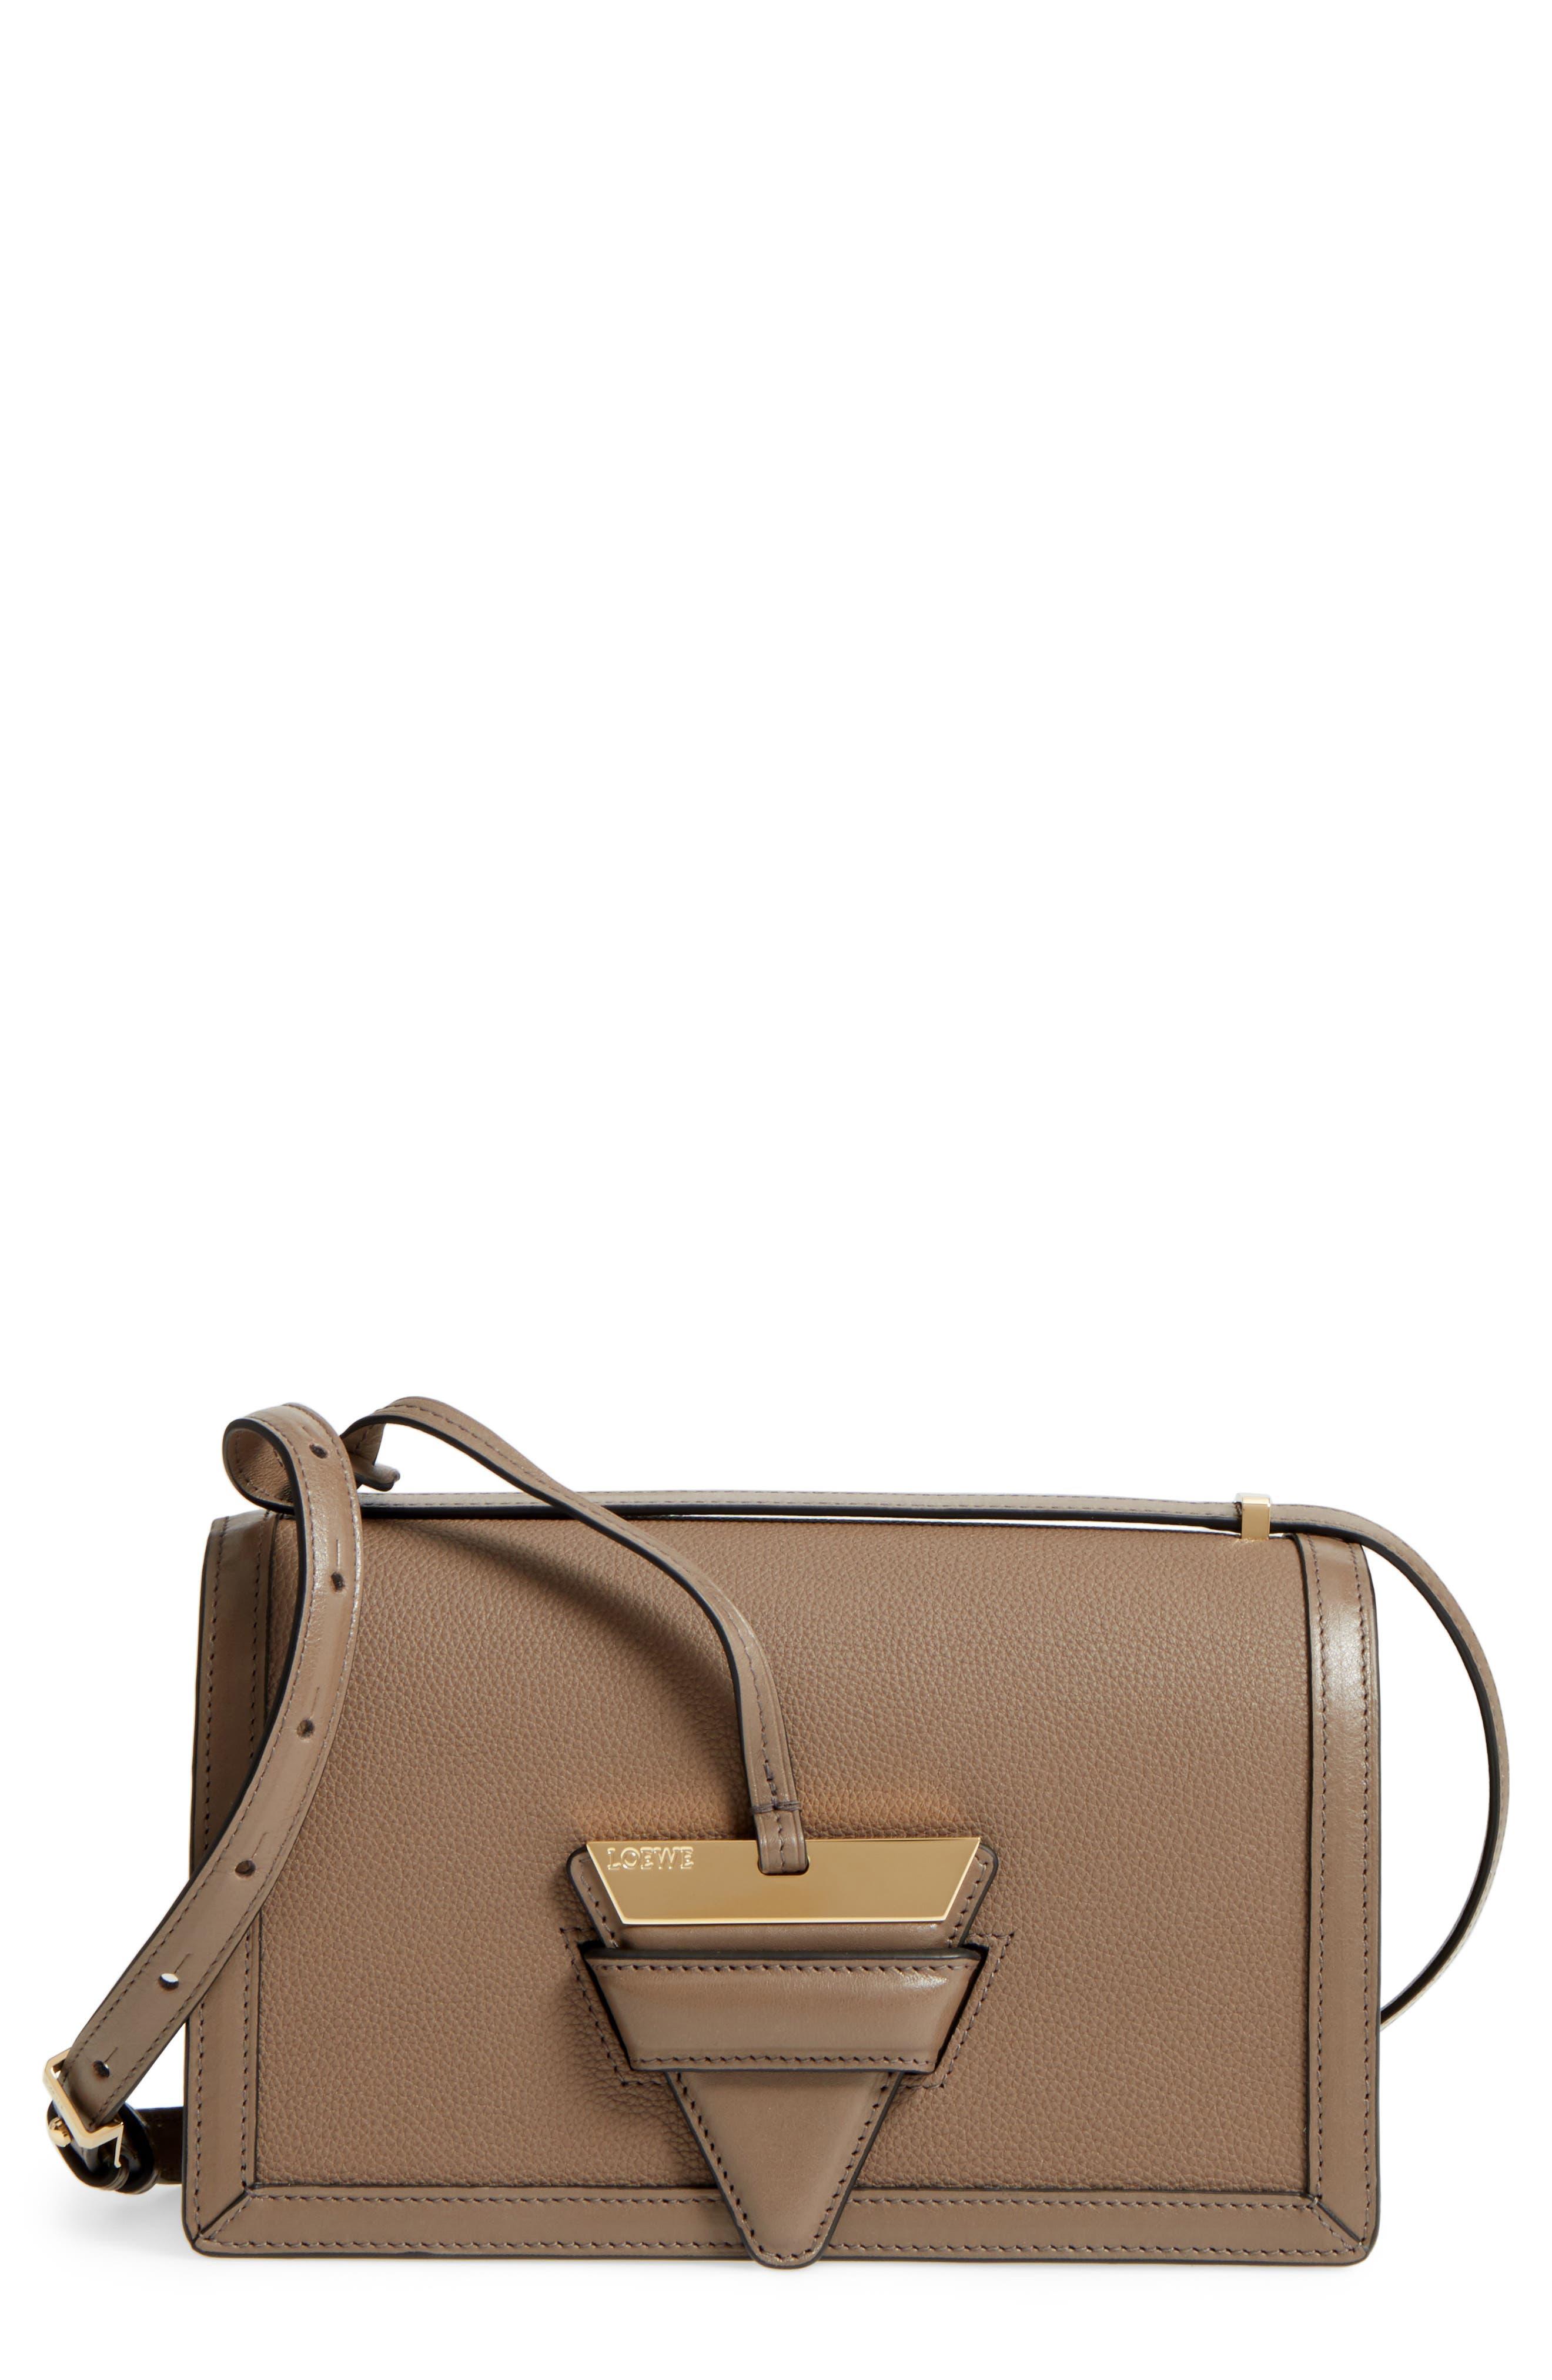 Main Image - Loewe Medium Barcelona Leather Crossbody Bag